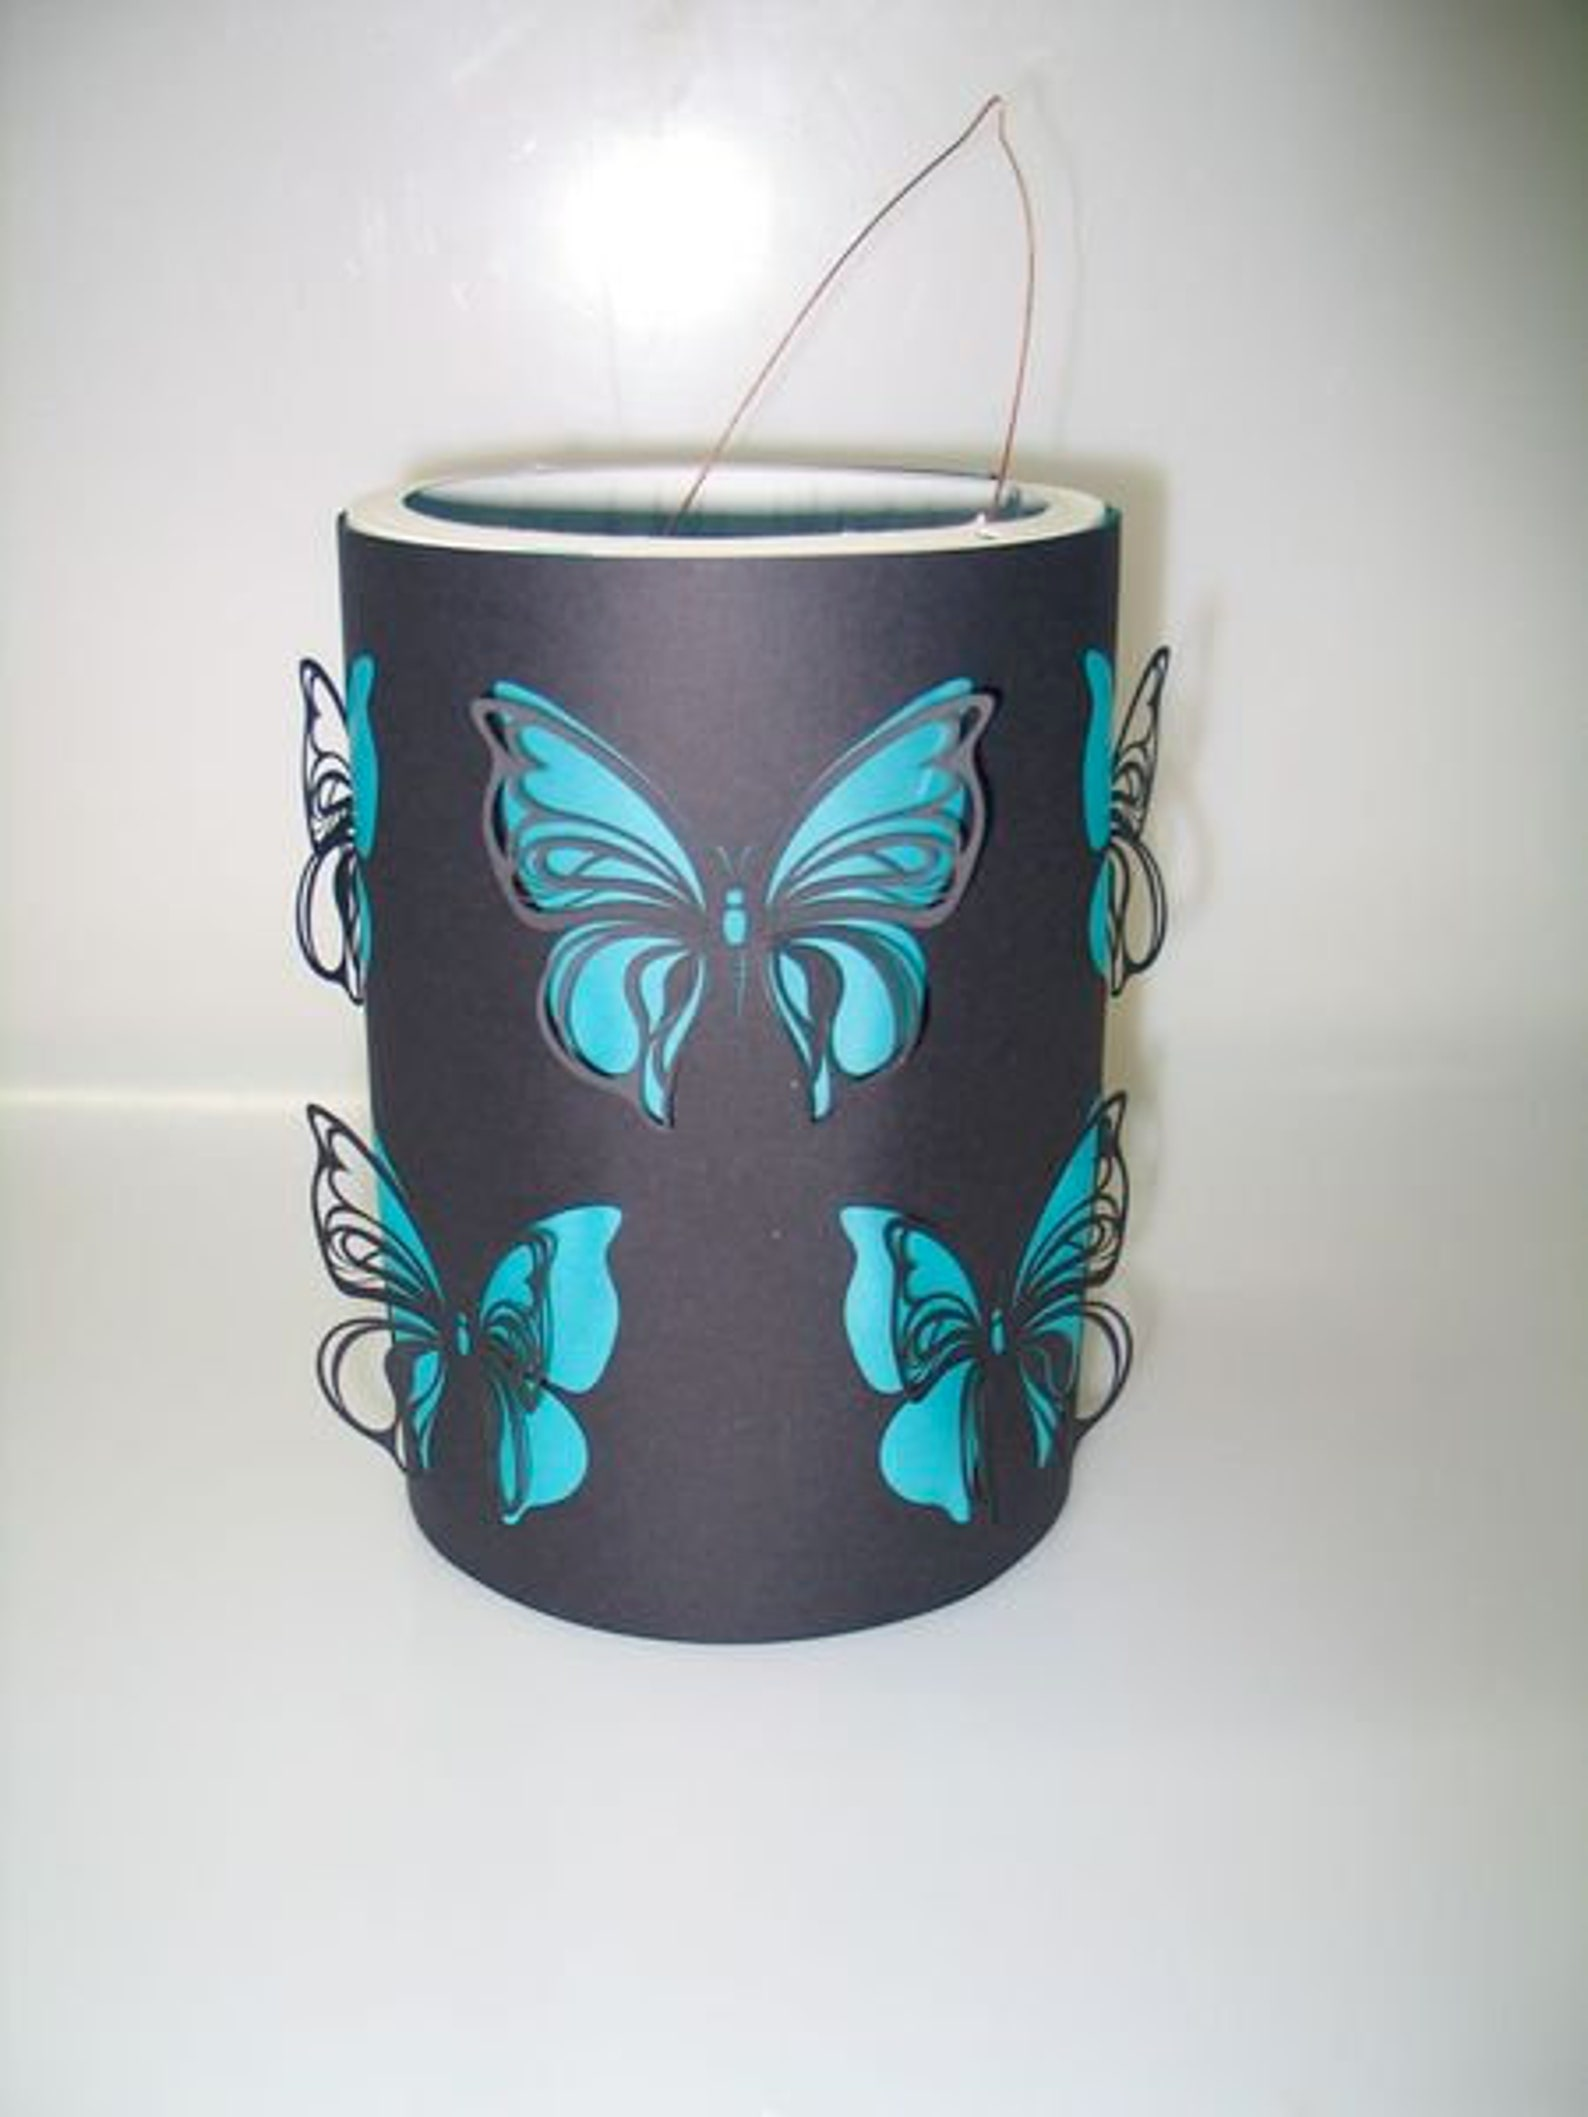 Craft Set Lantern Butterfly, St. Martin's Lantern, Halloween Lantern, Lantern Crafting for Lantern Parade